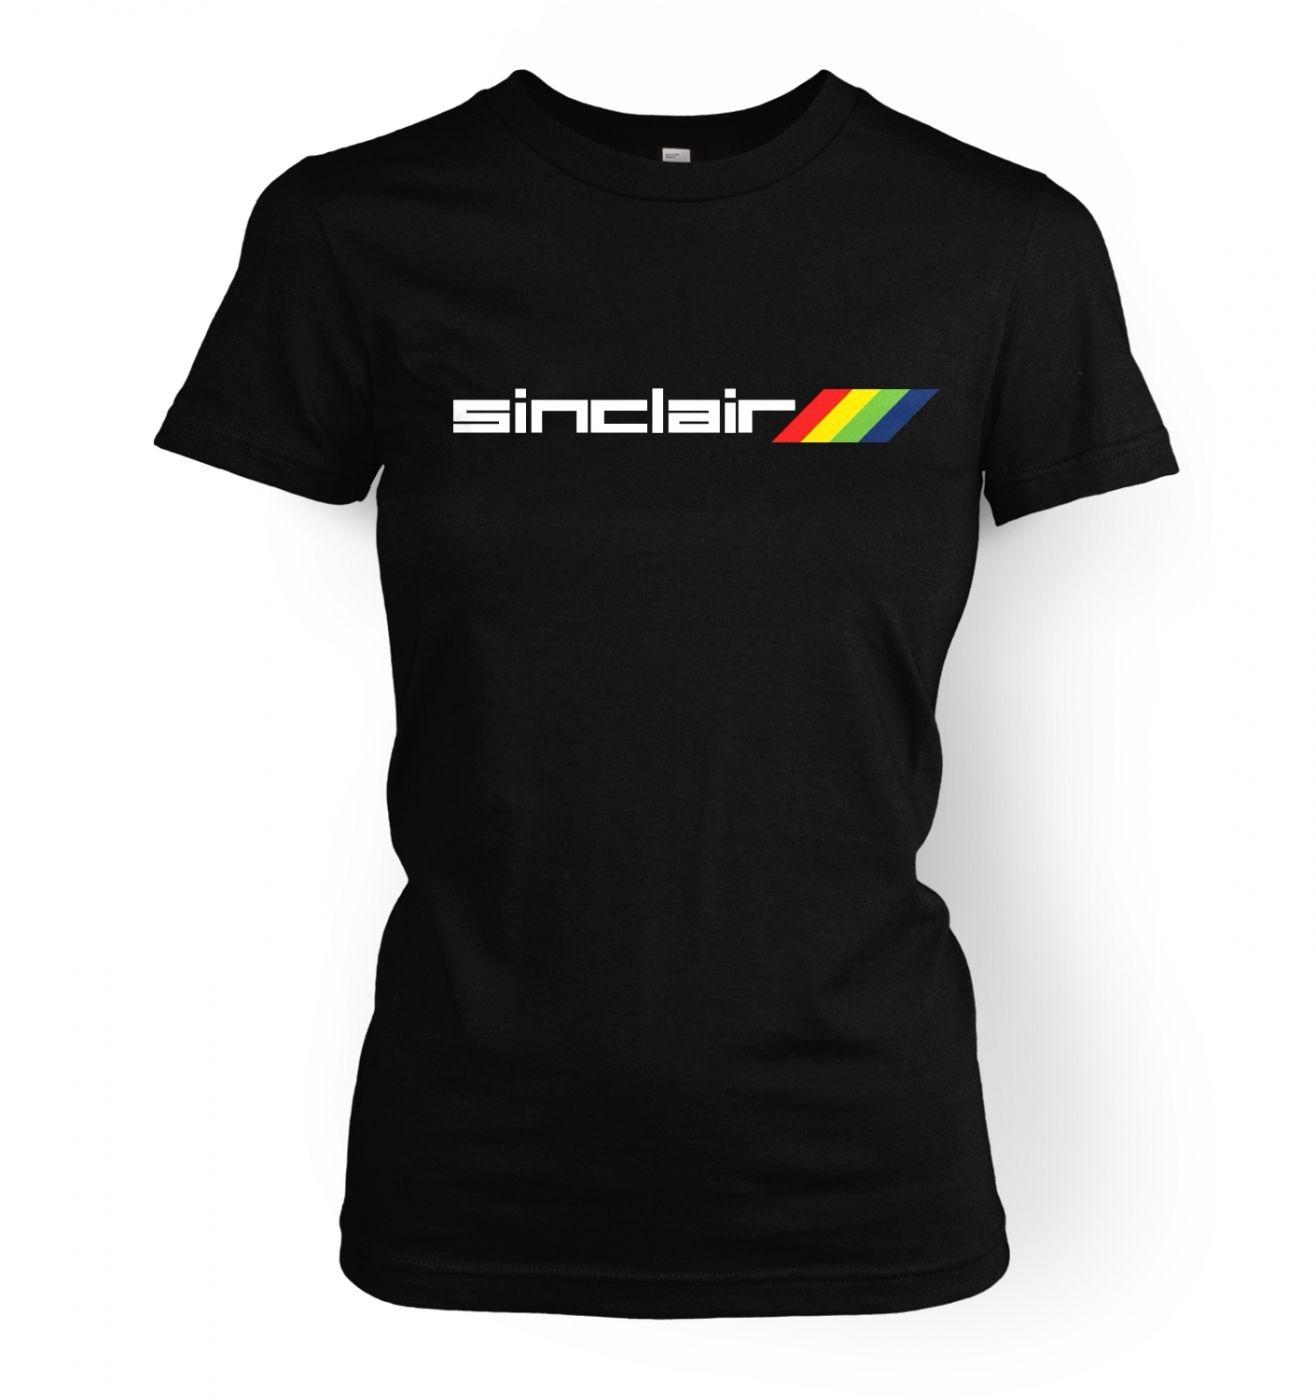 Sinclair Logo women's fitted t-shirt